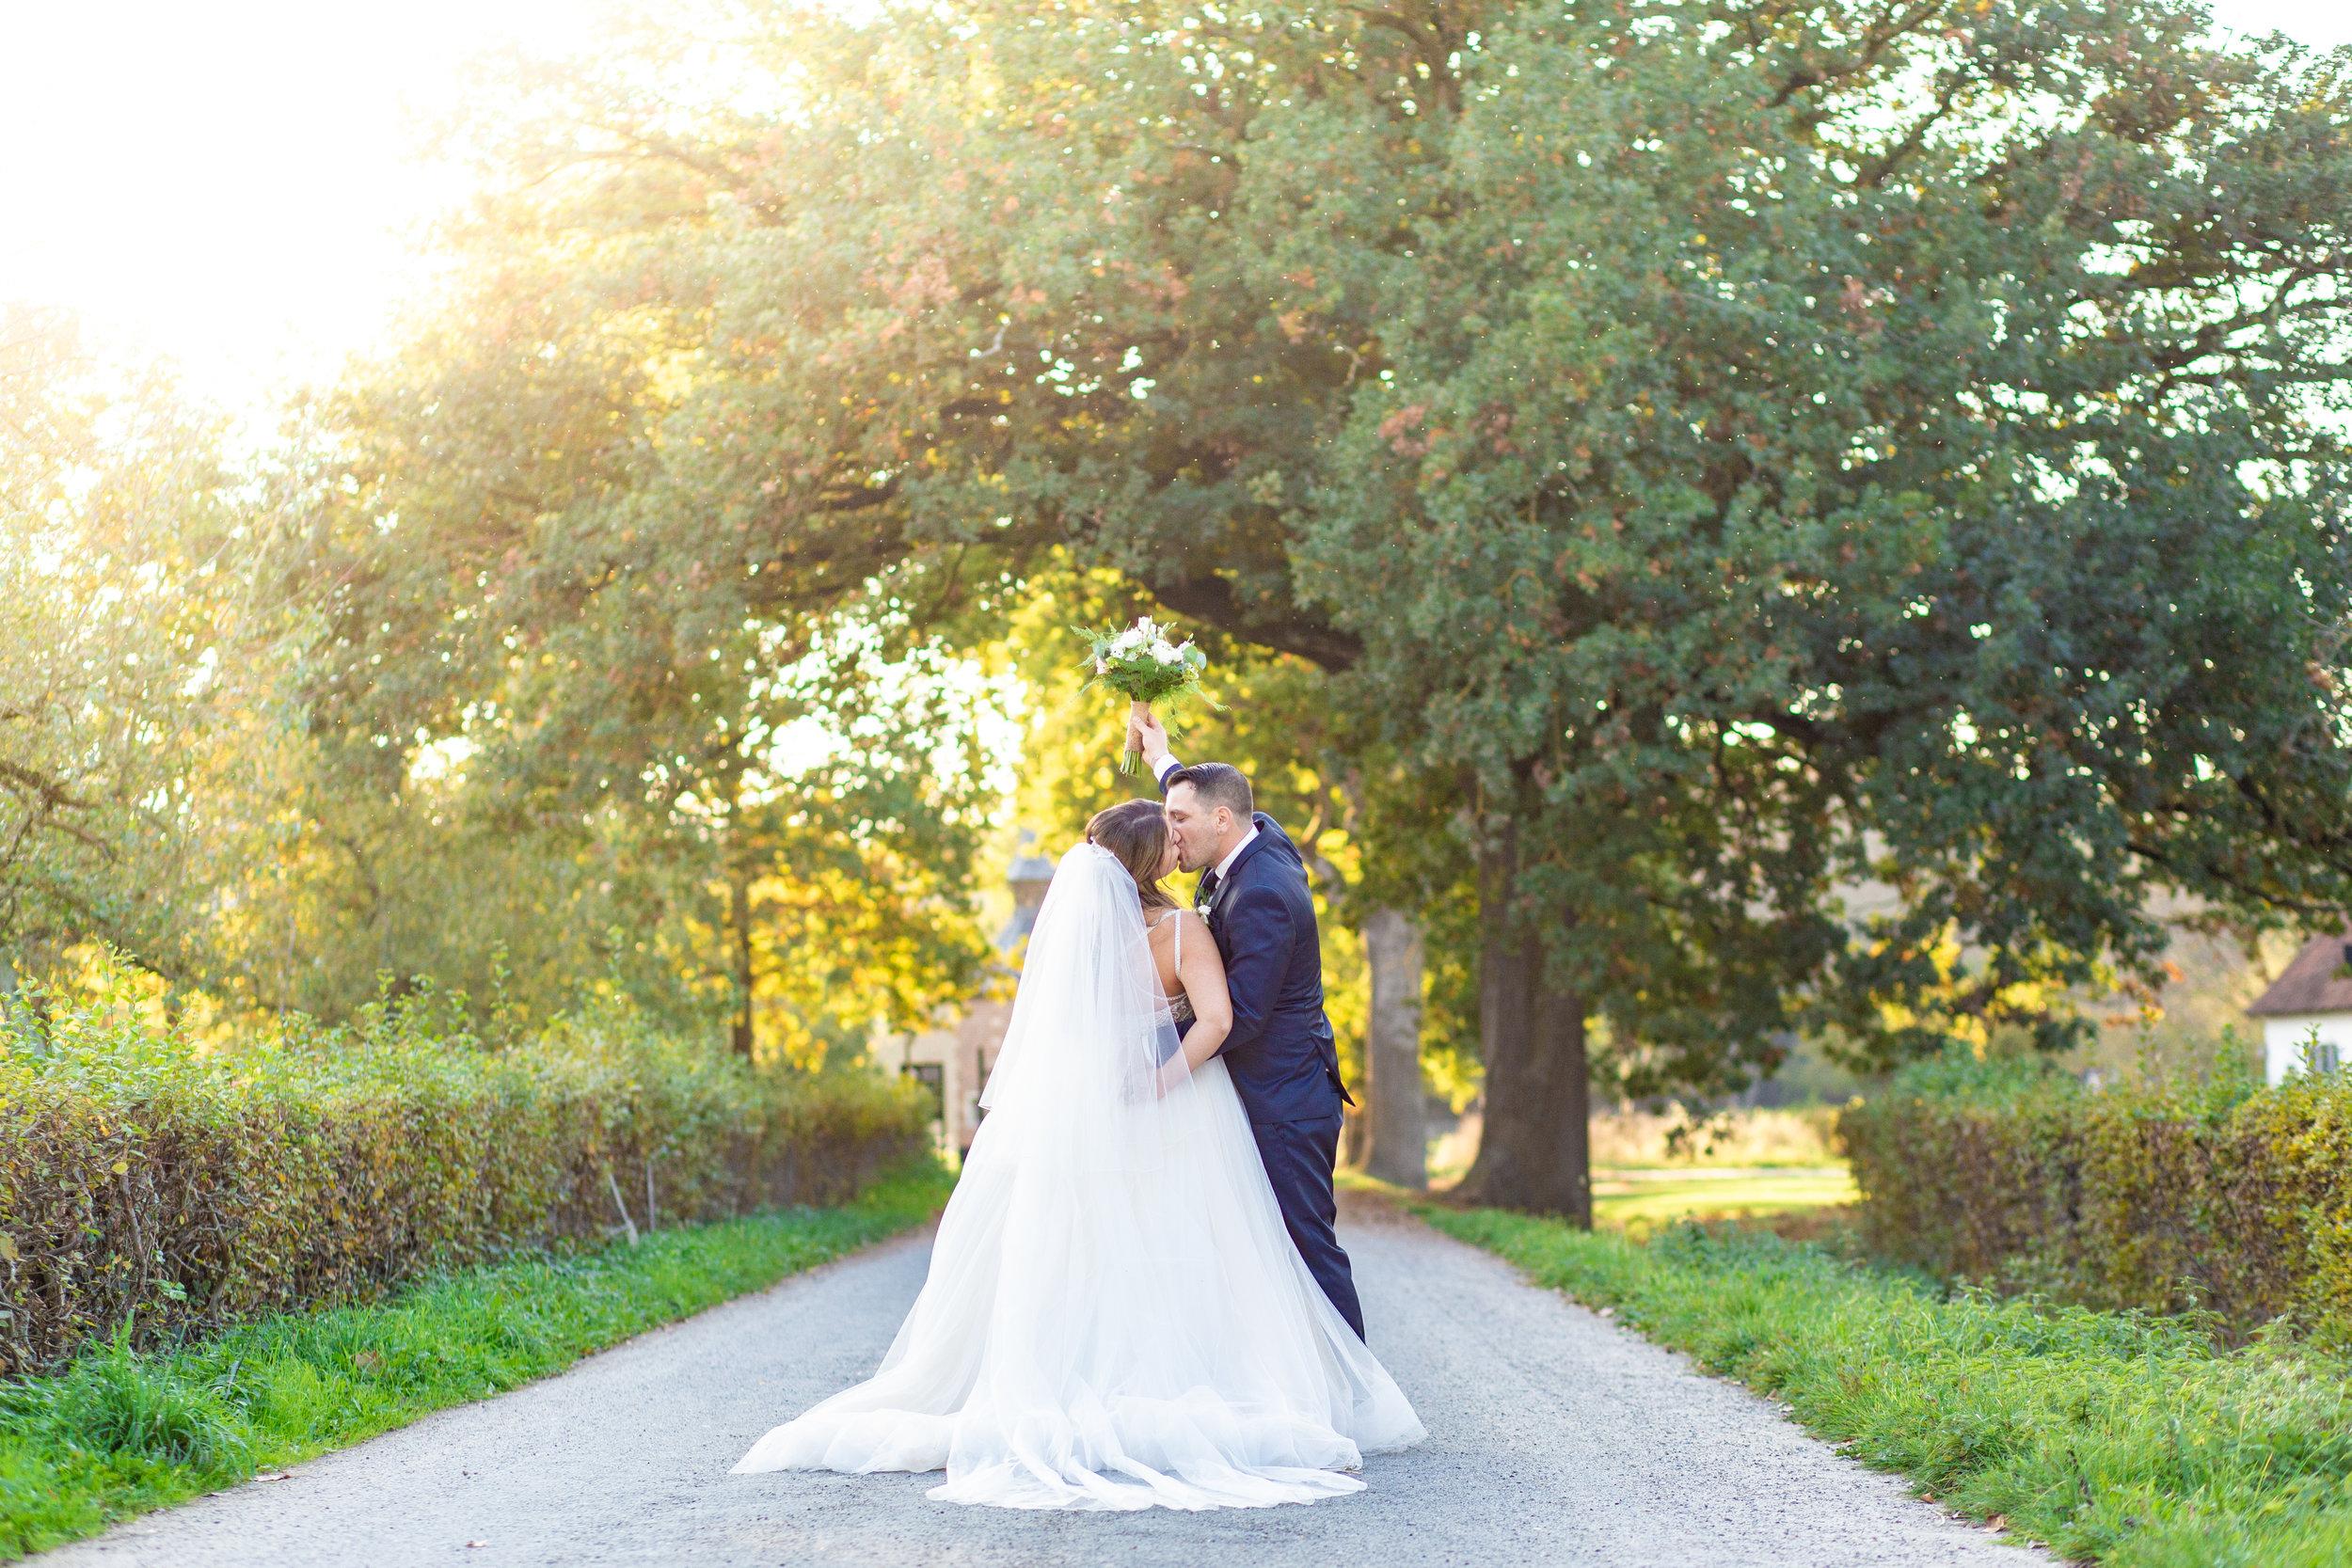 Stephanie & Davide - Huwelijk - 20 oktober 2019